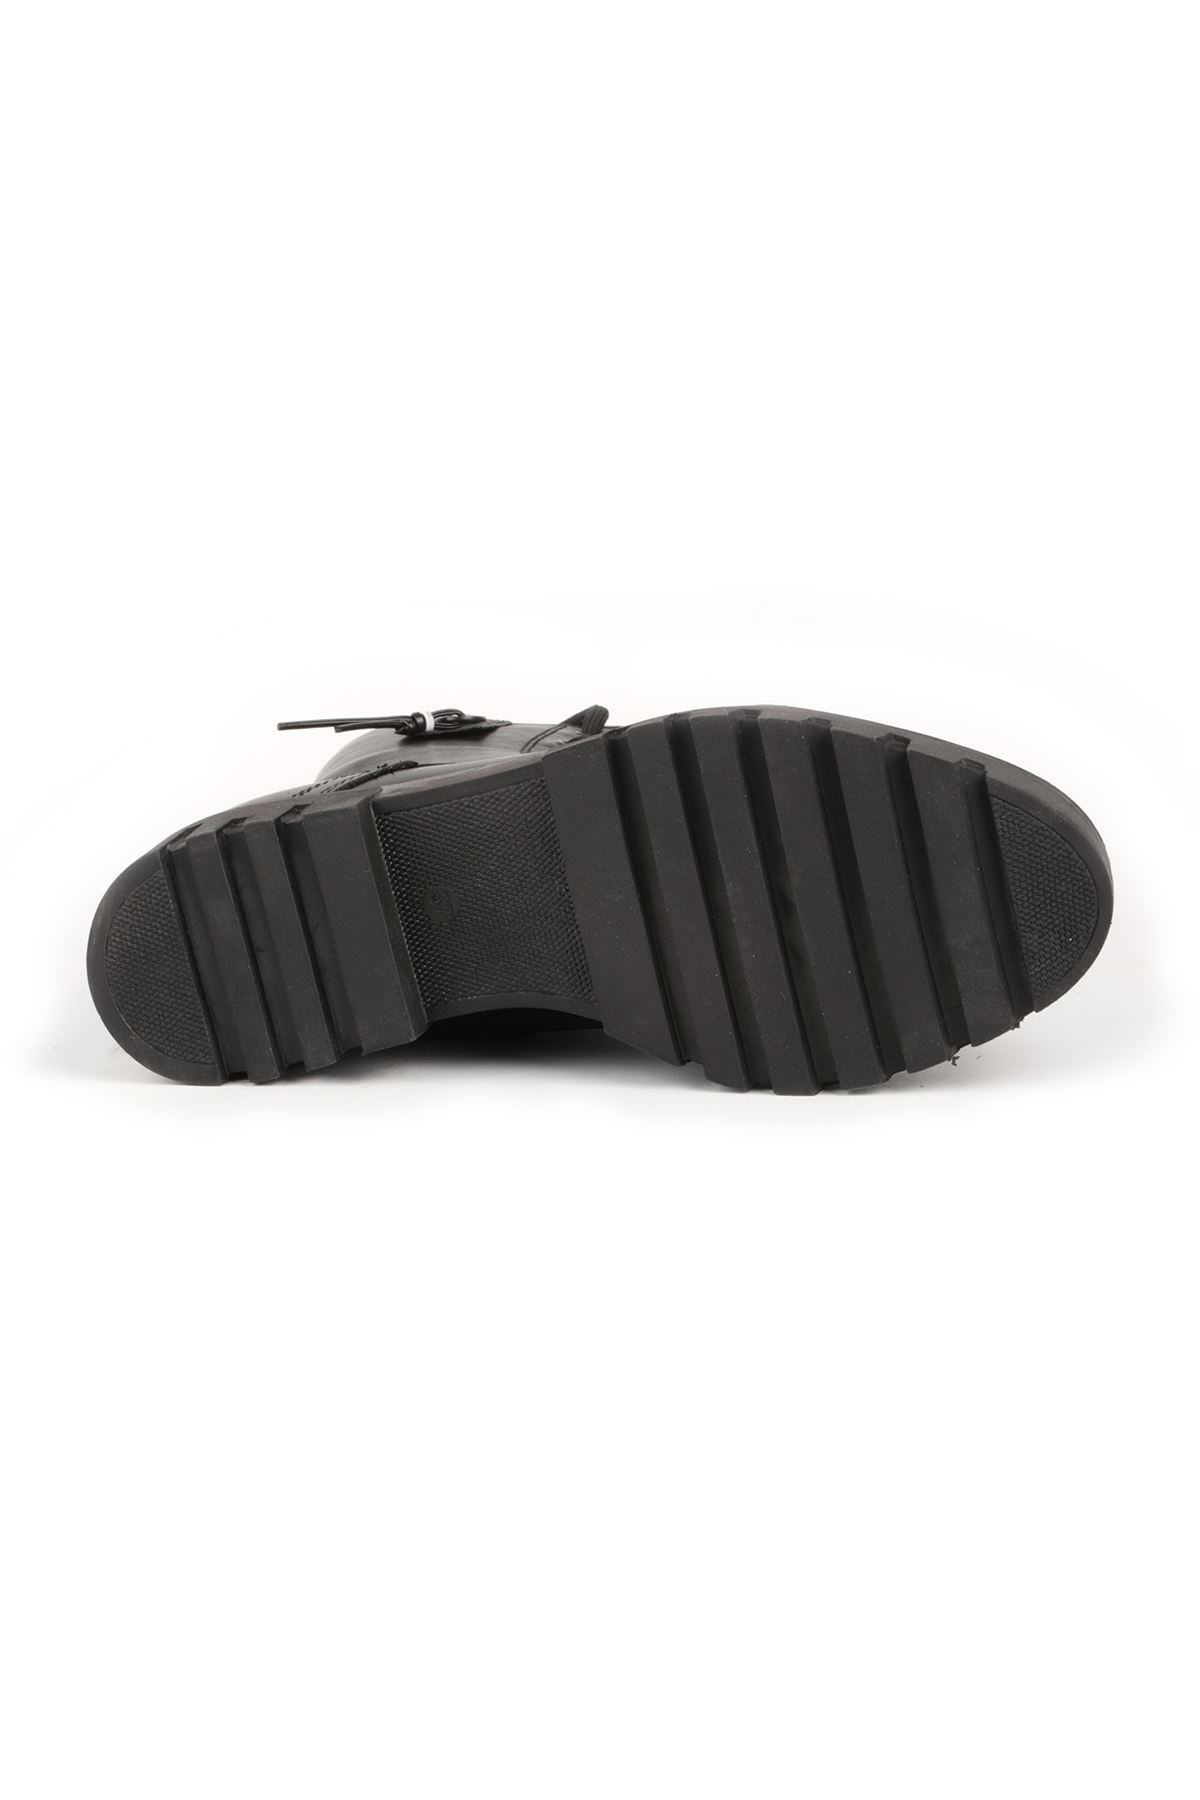 Libero MR10760 Black Leather Boot